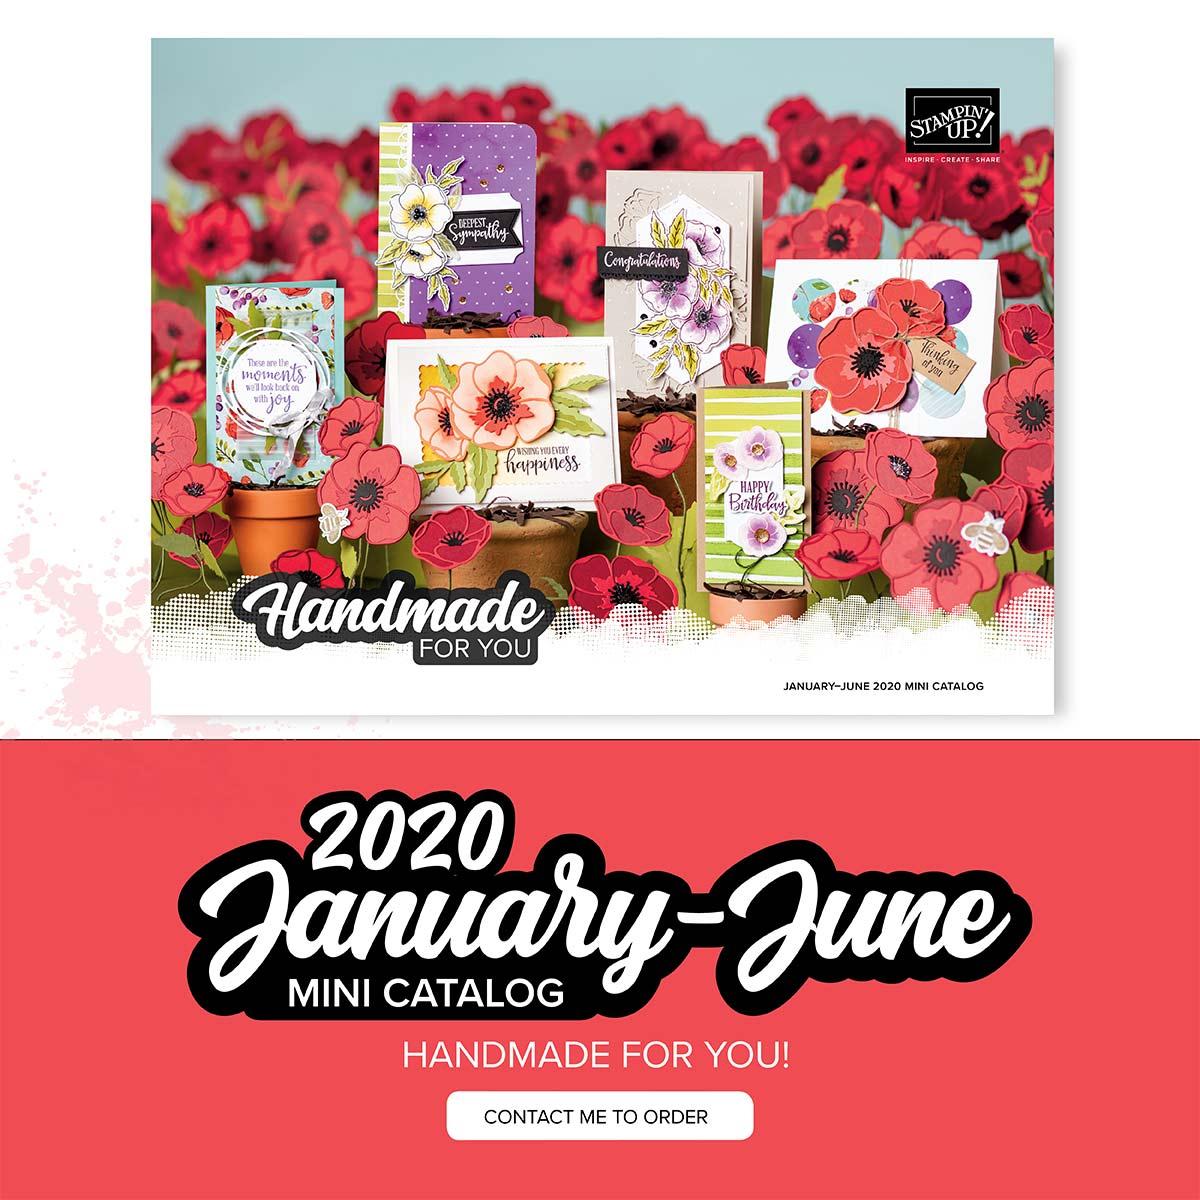 2020 Mini Catalog